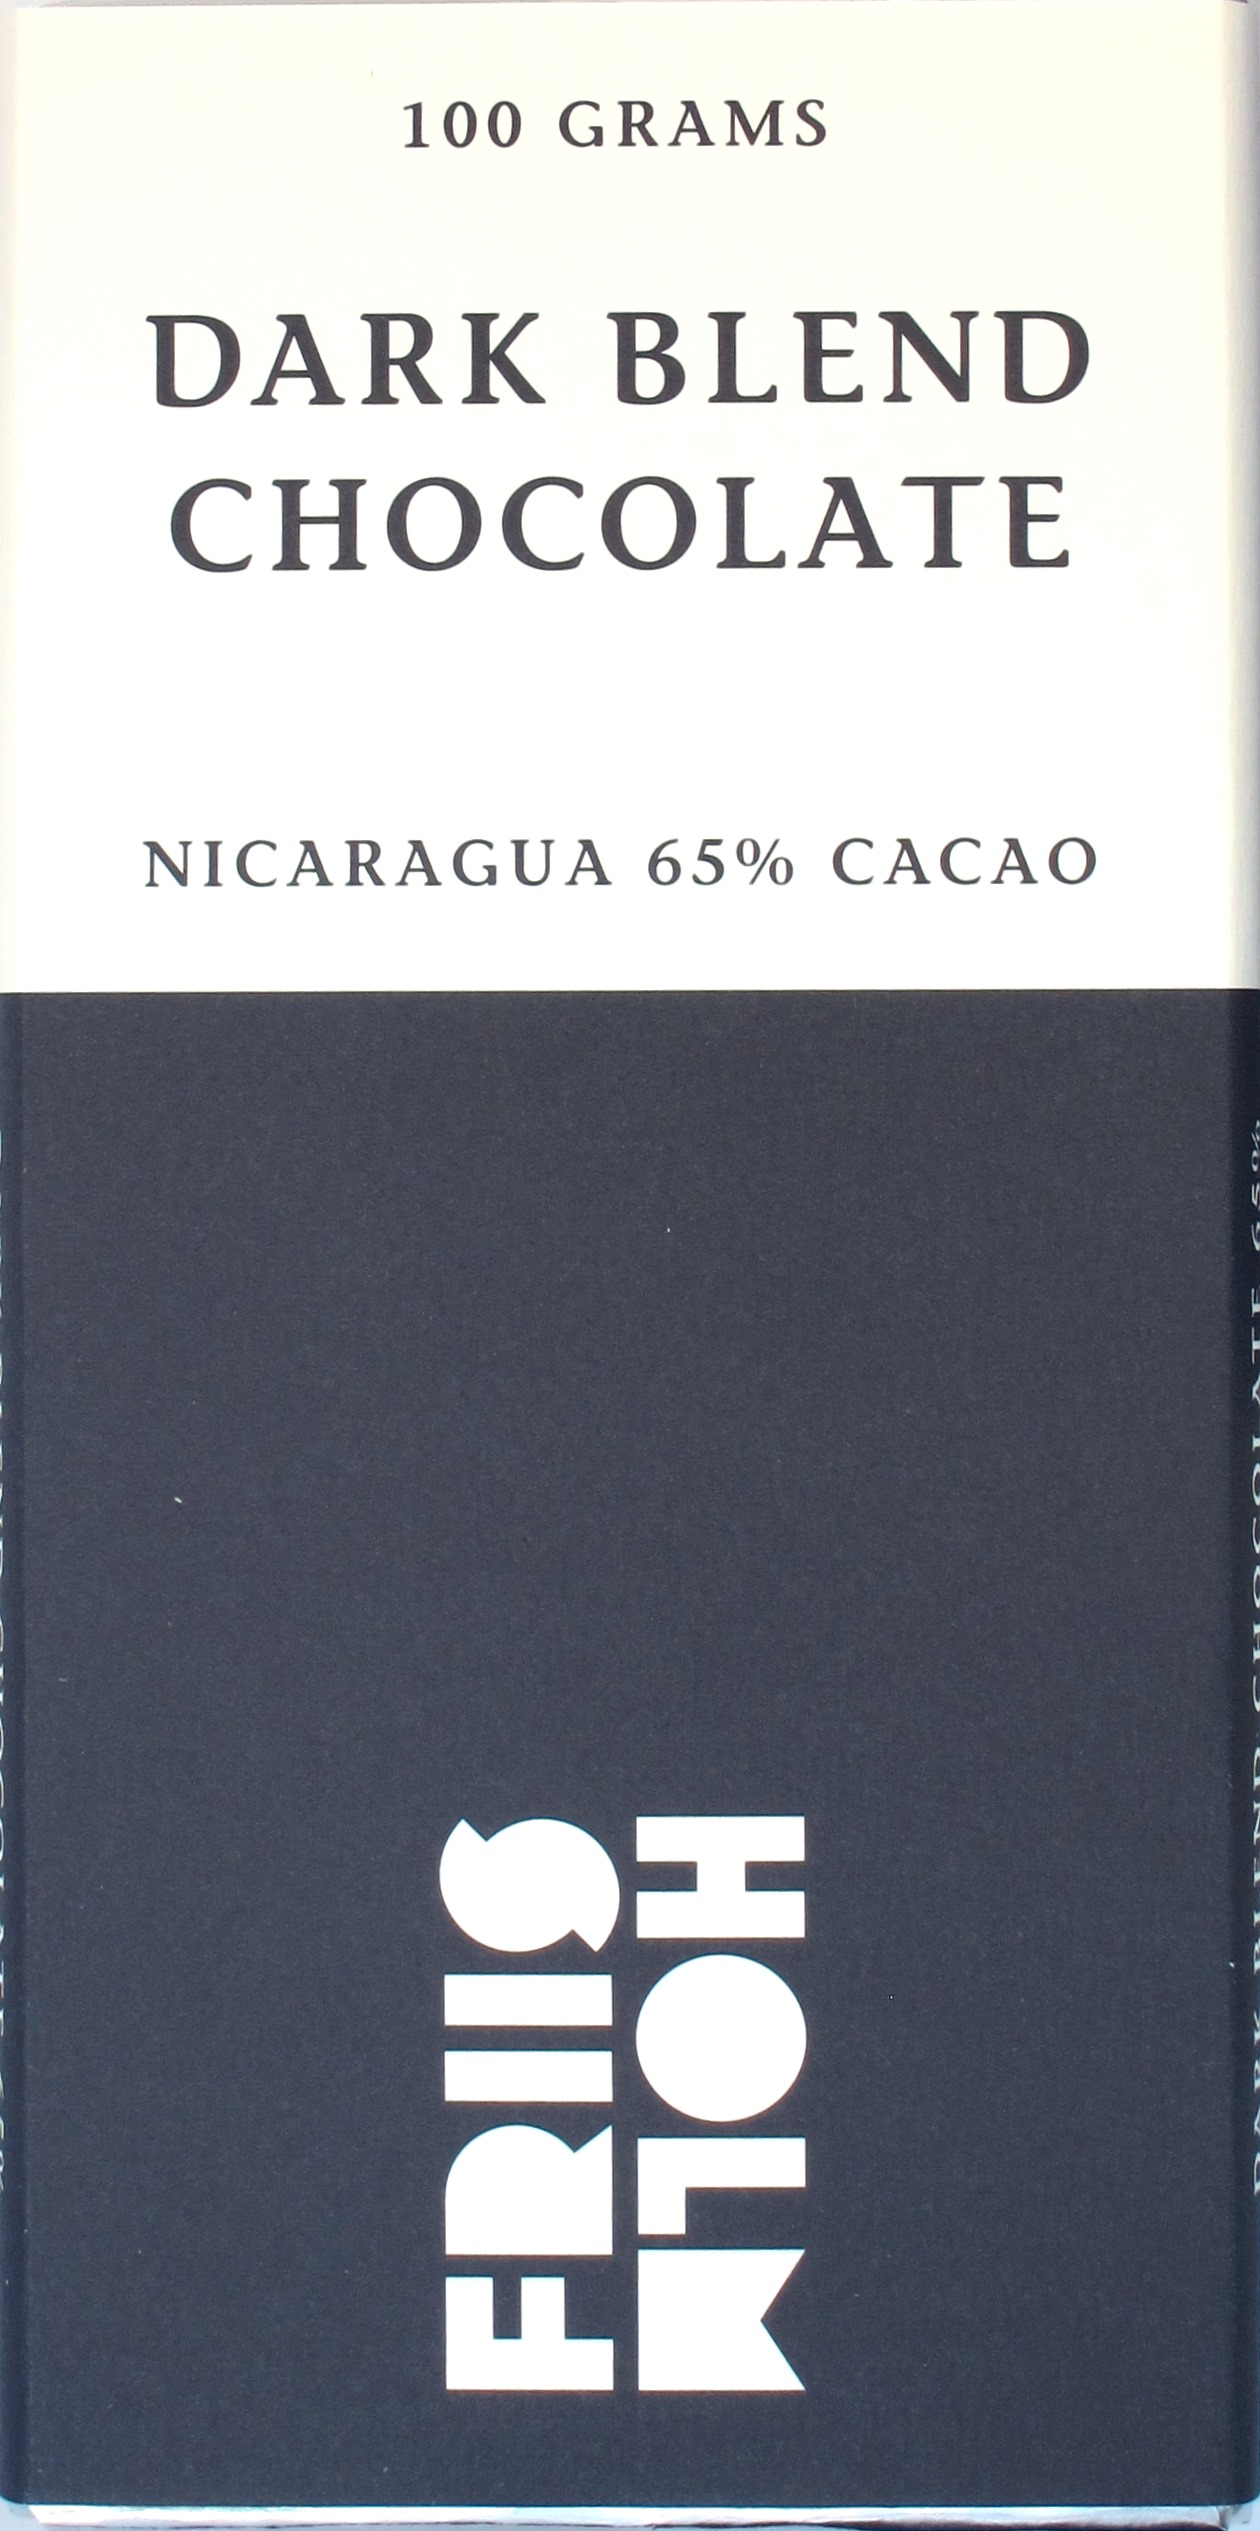 Umschlag der dänischen Bitterschokolade Friis-Holm Dark Blend Nicaragua 65%